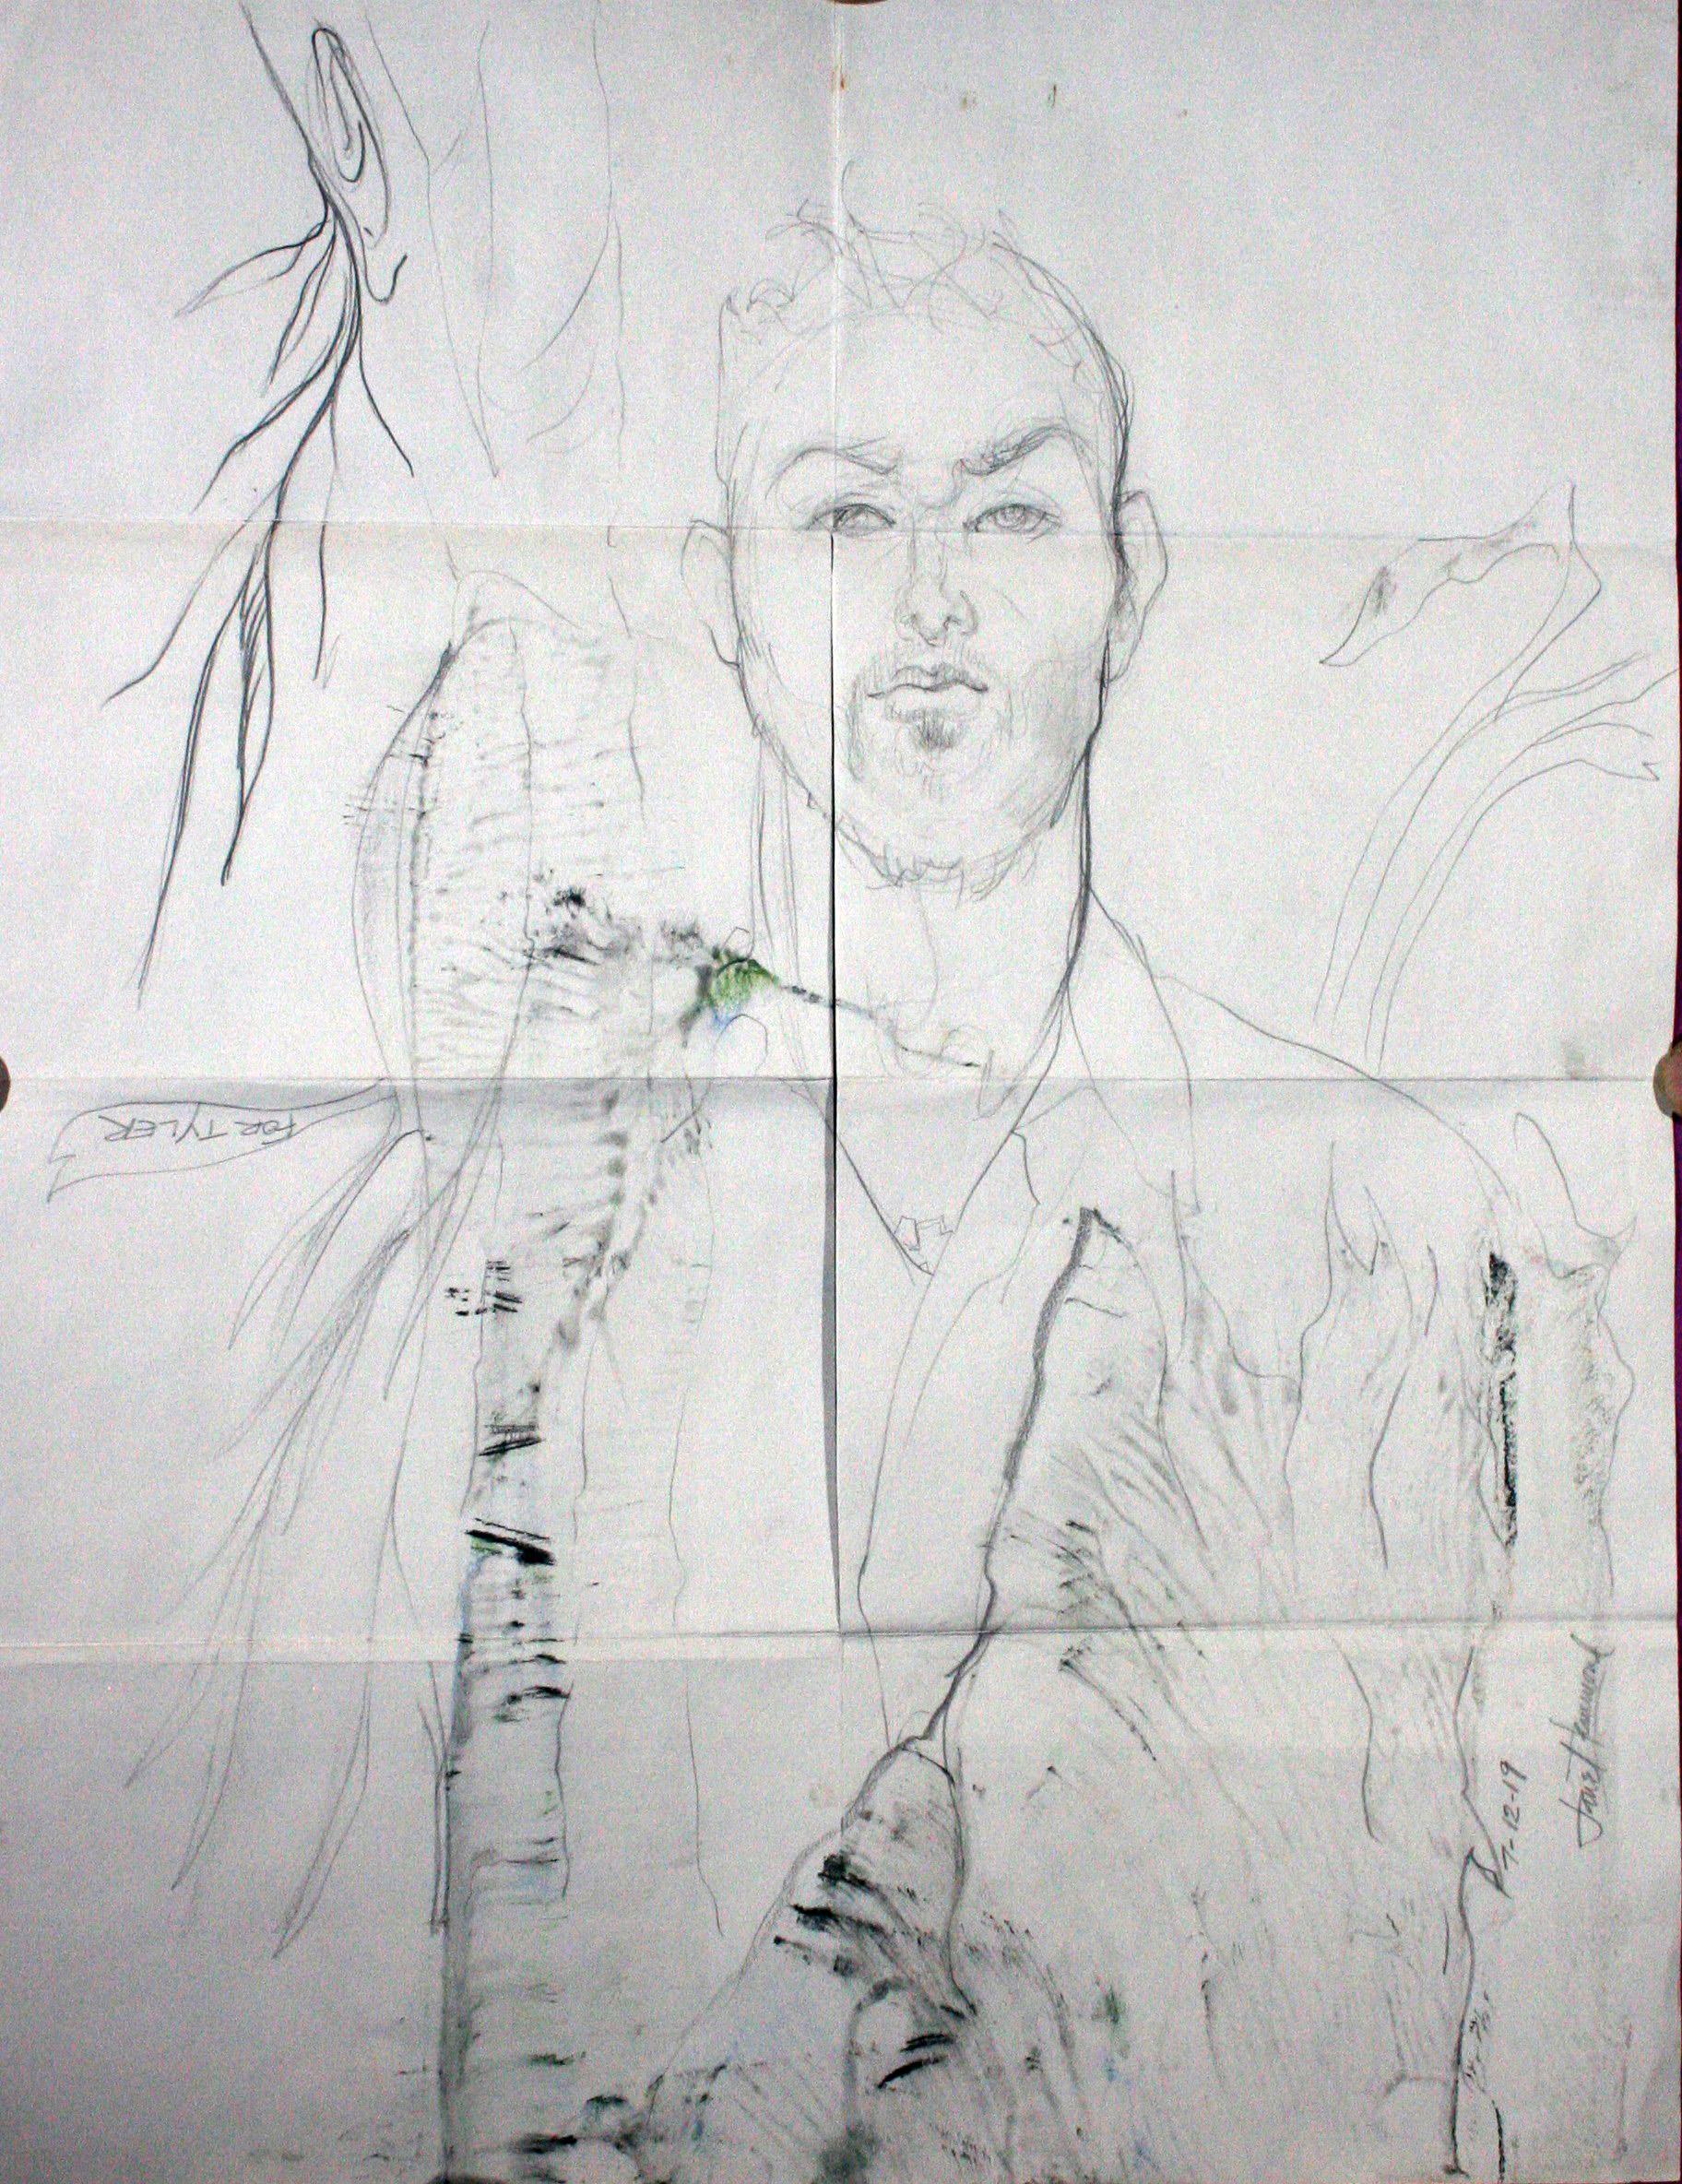 Jane Clay Teasley Hammond - pencil